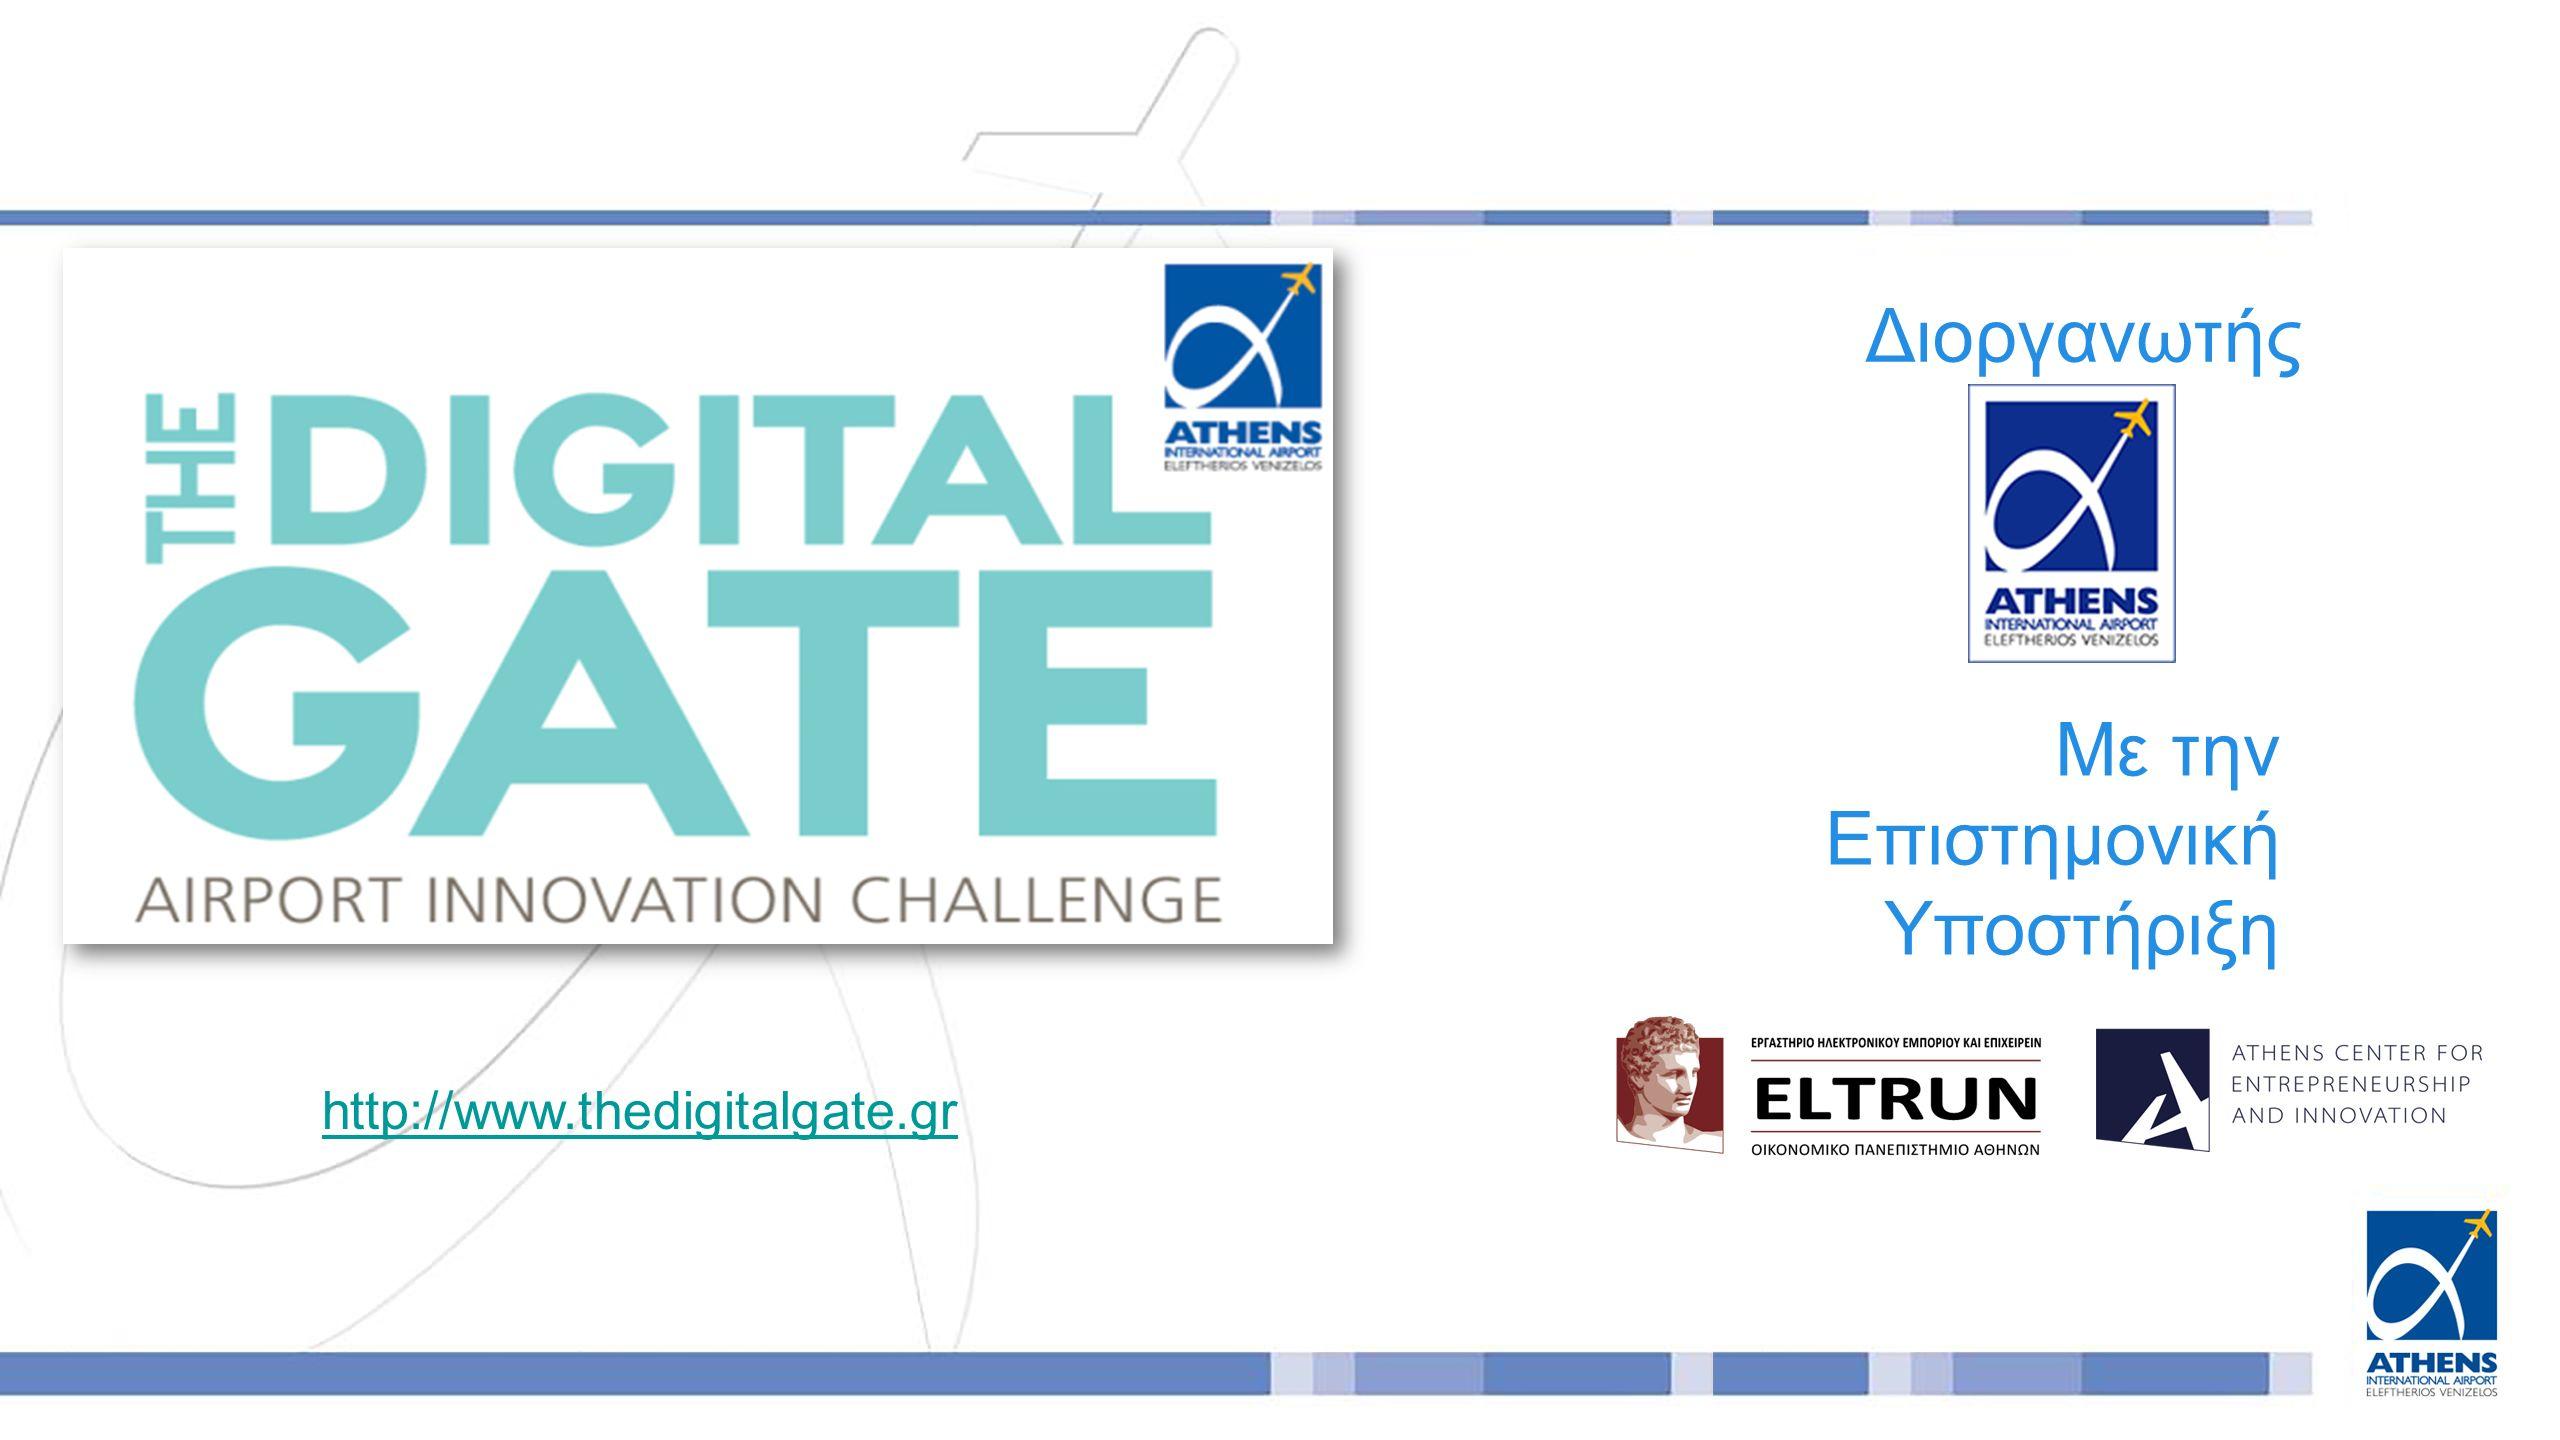 http://www.thedigitalgate.gr Διοργανωτής Με την Επιστημονική Υποστήριξη